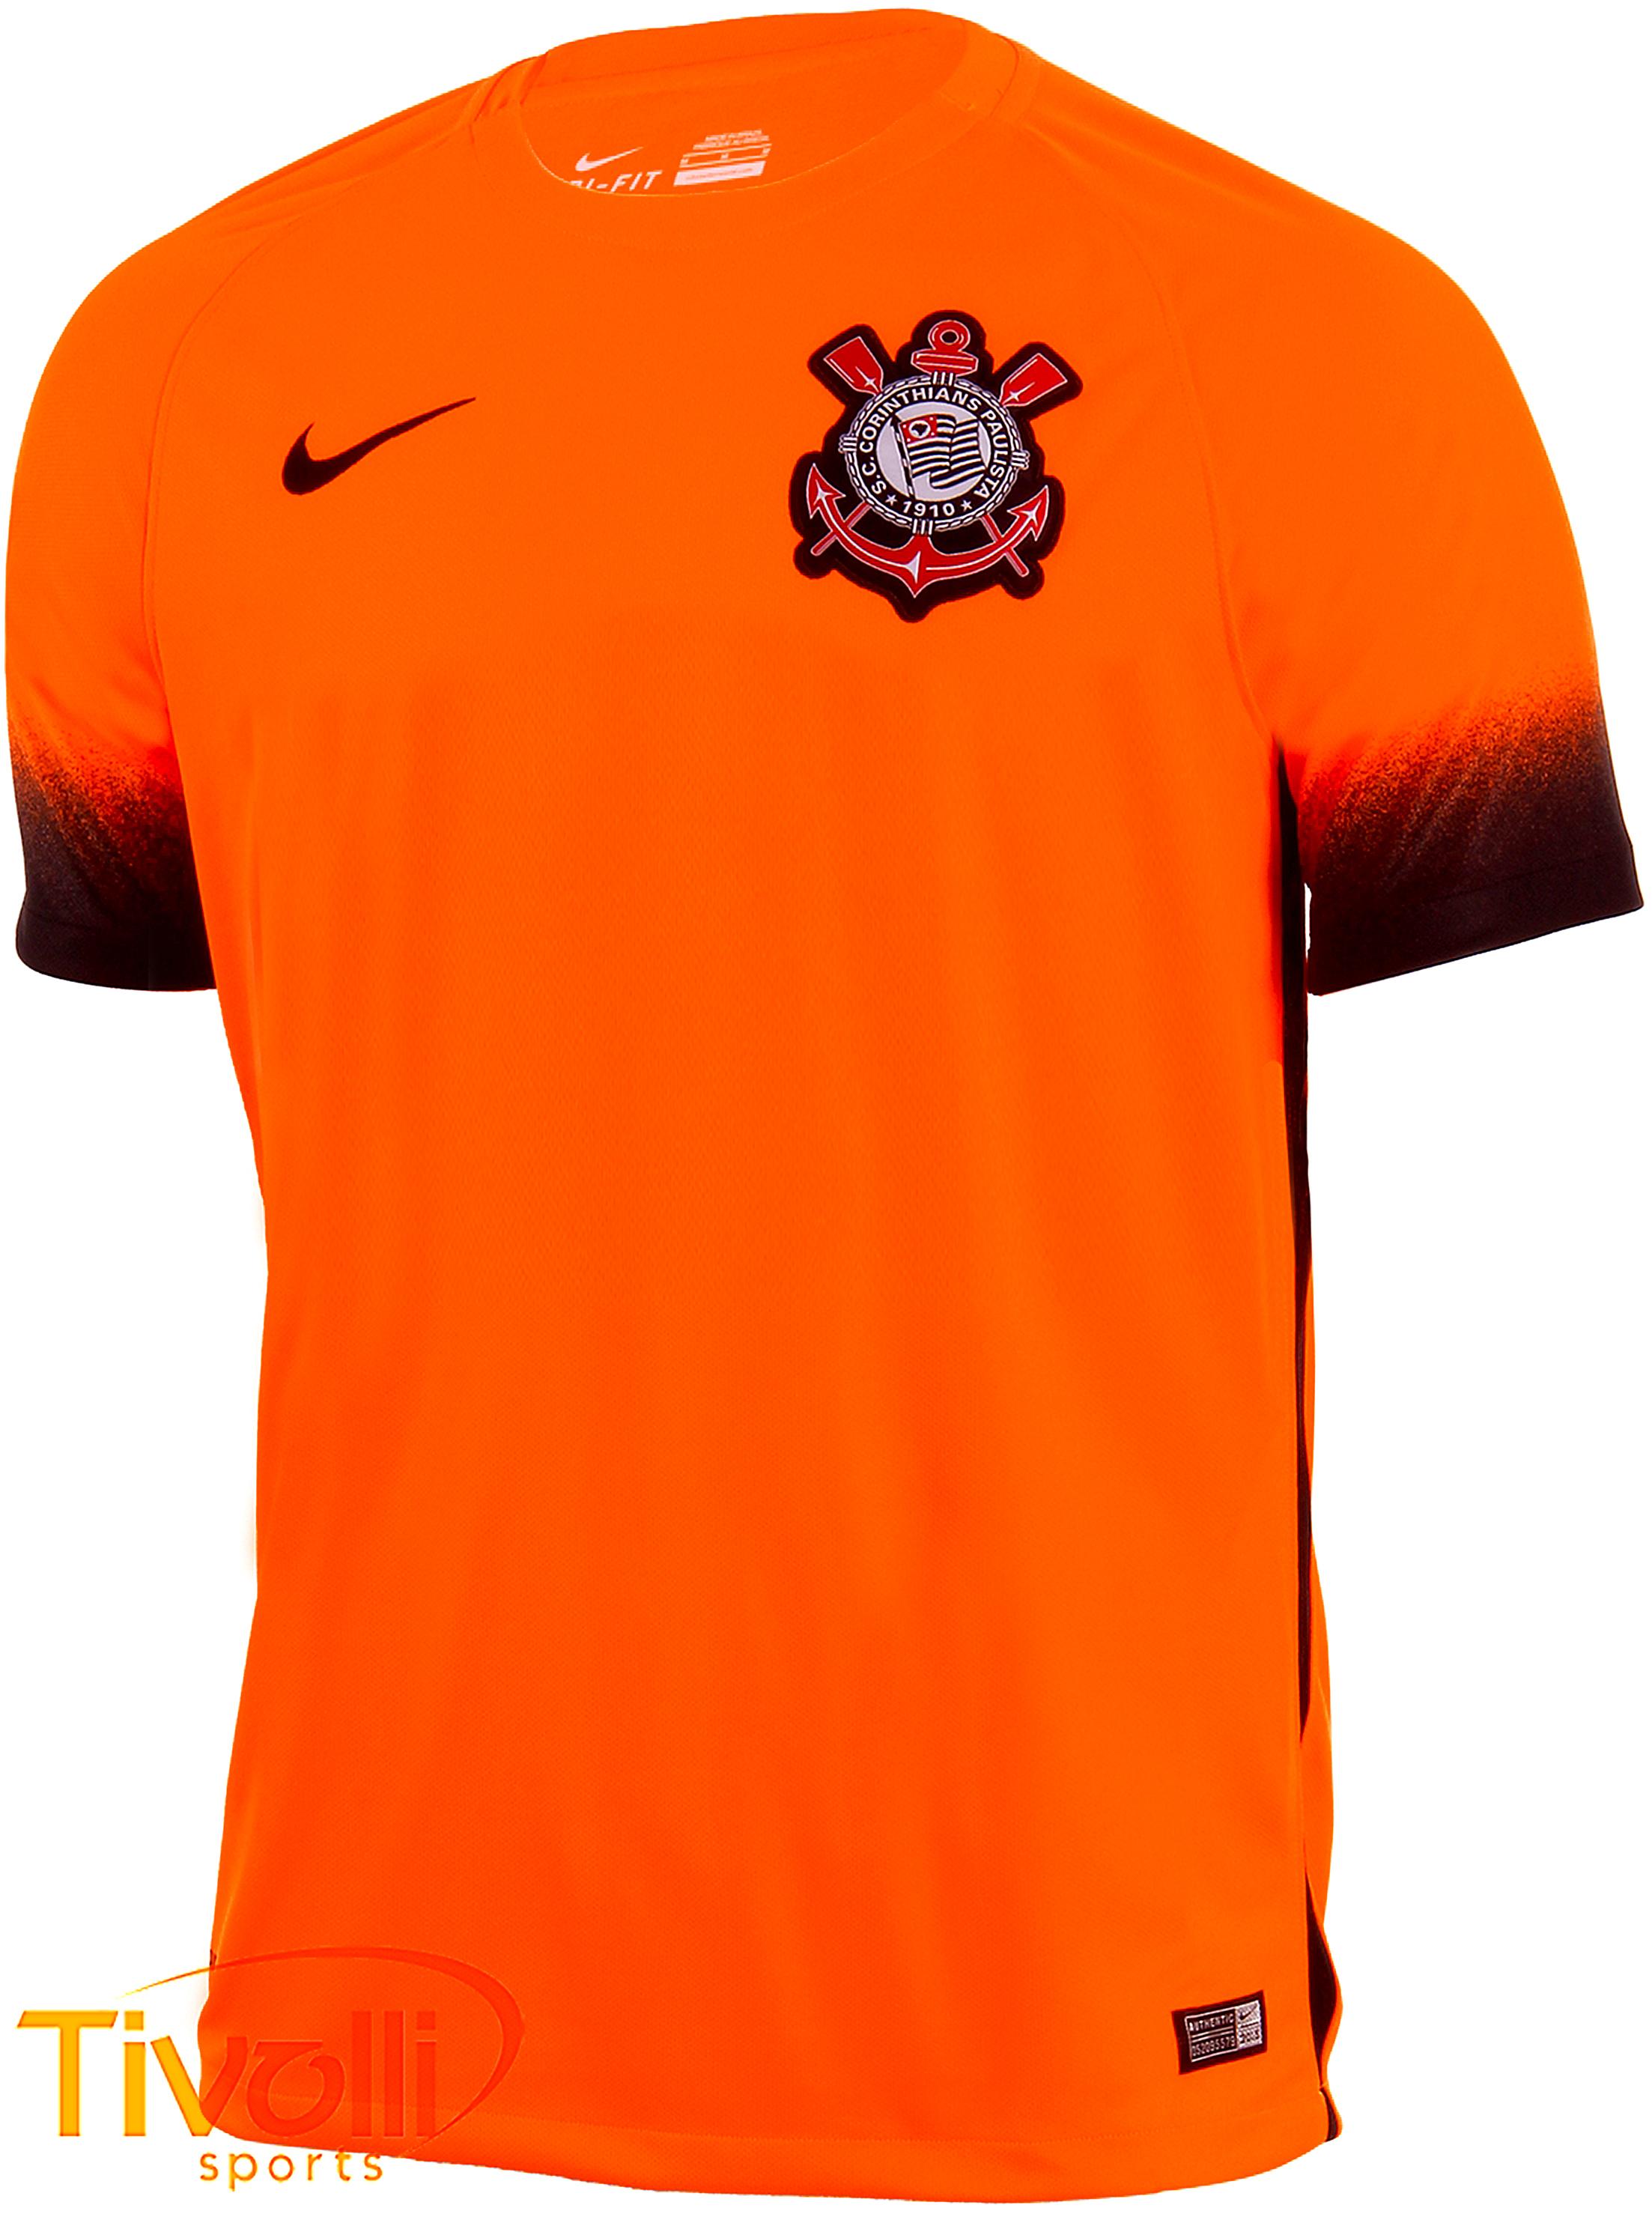 Black Friday - Camisa Corinthians III Infantil torcedor 2015 2016 Nike  infantil laranja e preta e21b297ac3ee9